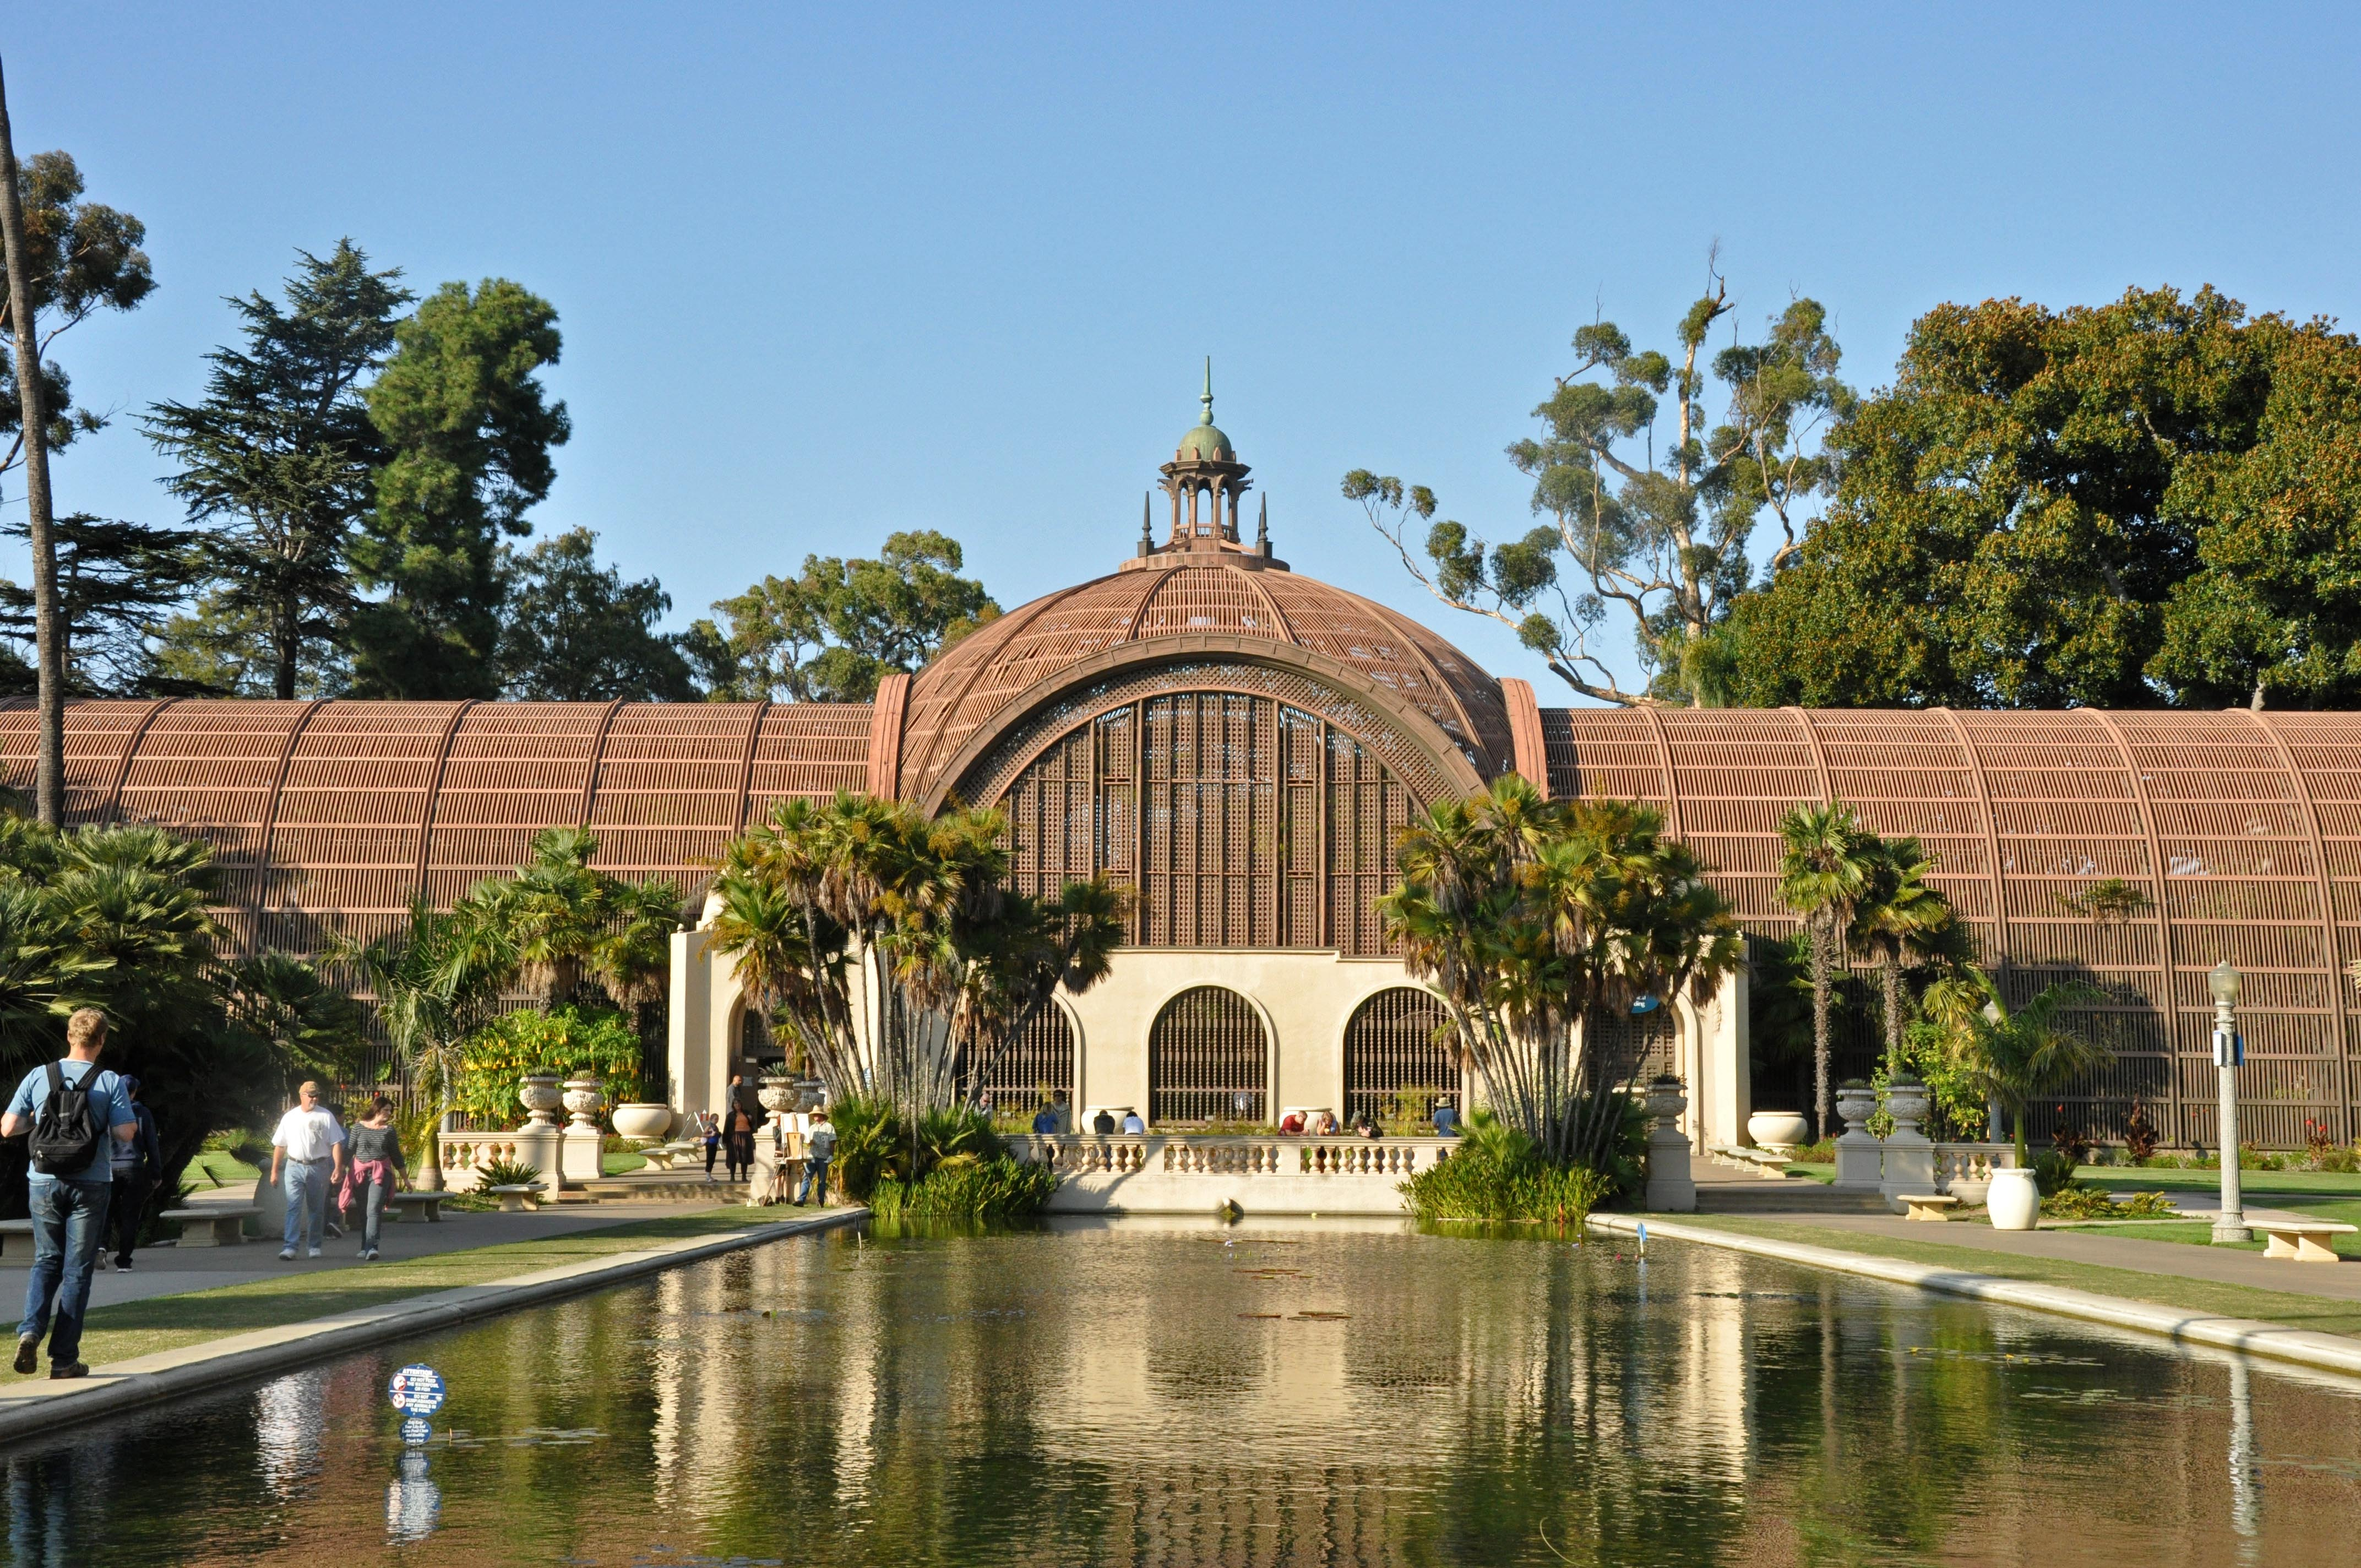 Balboa Garden